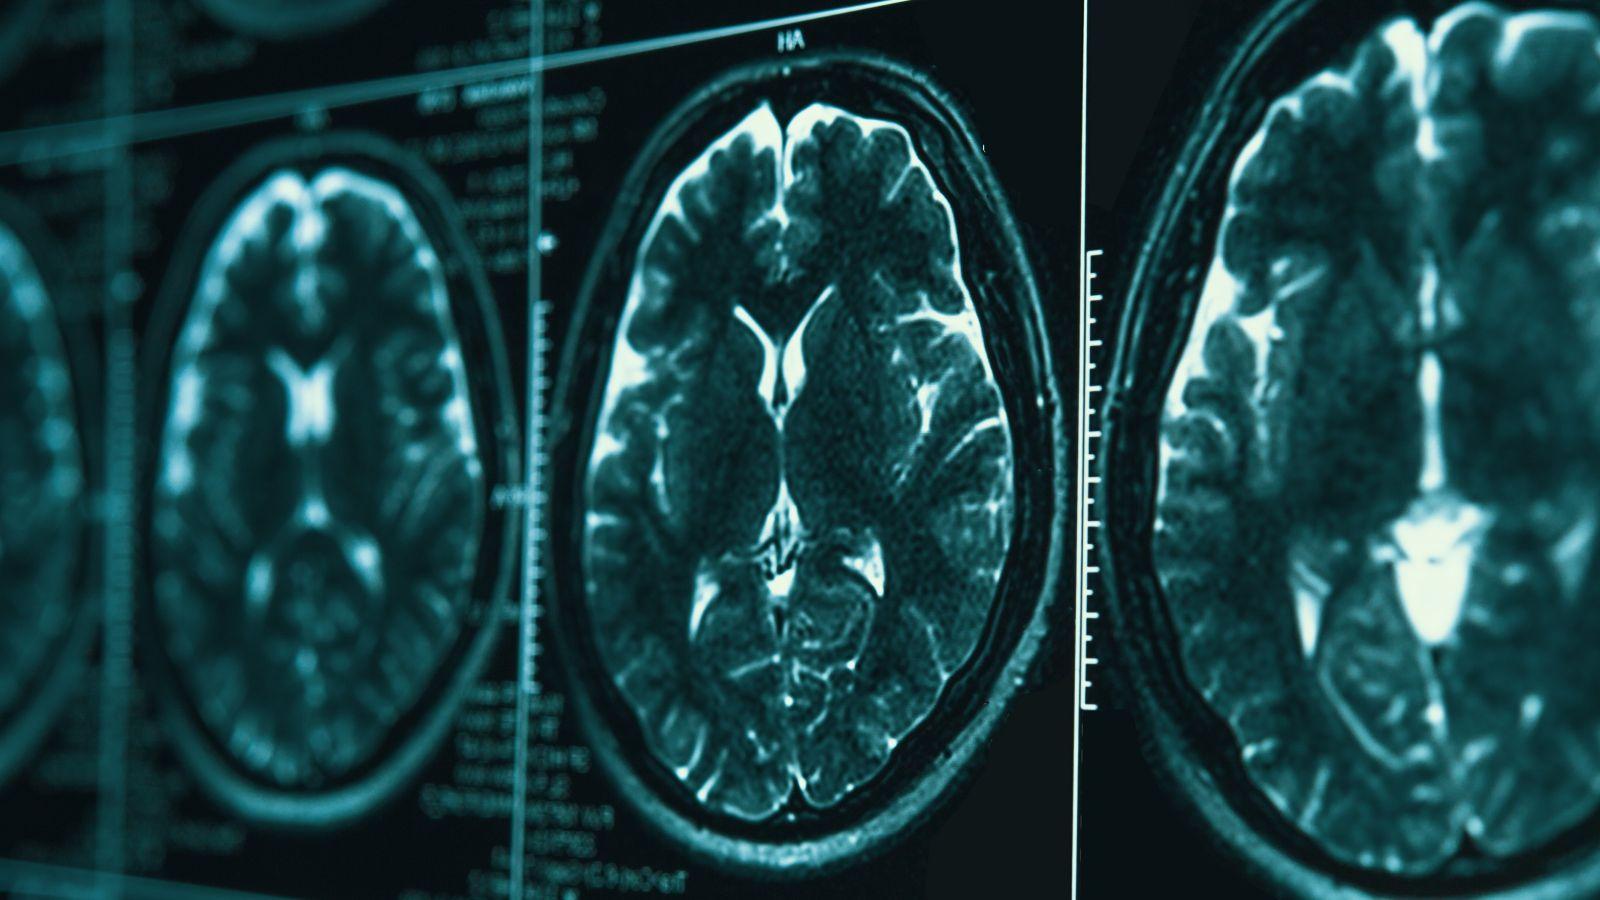 A series of MRI scans of a brain.